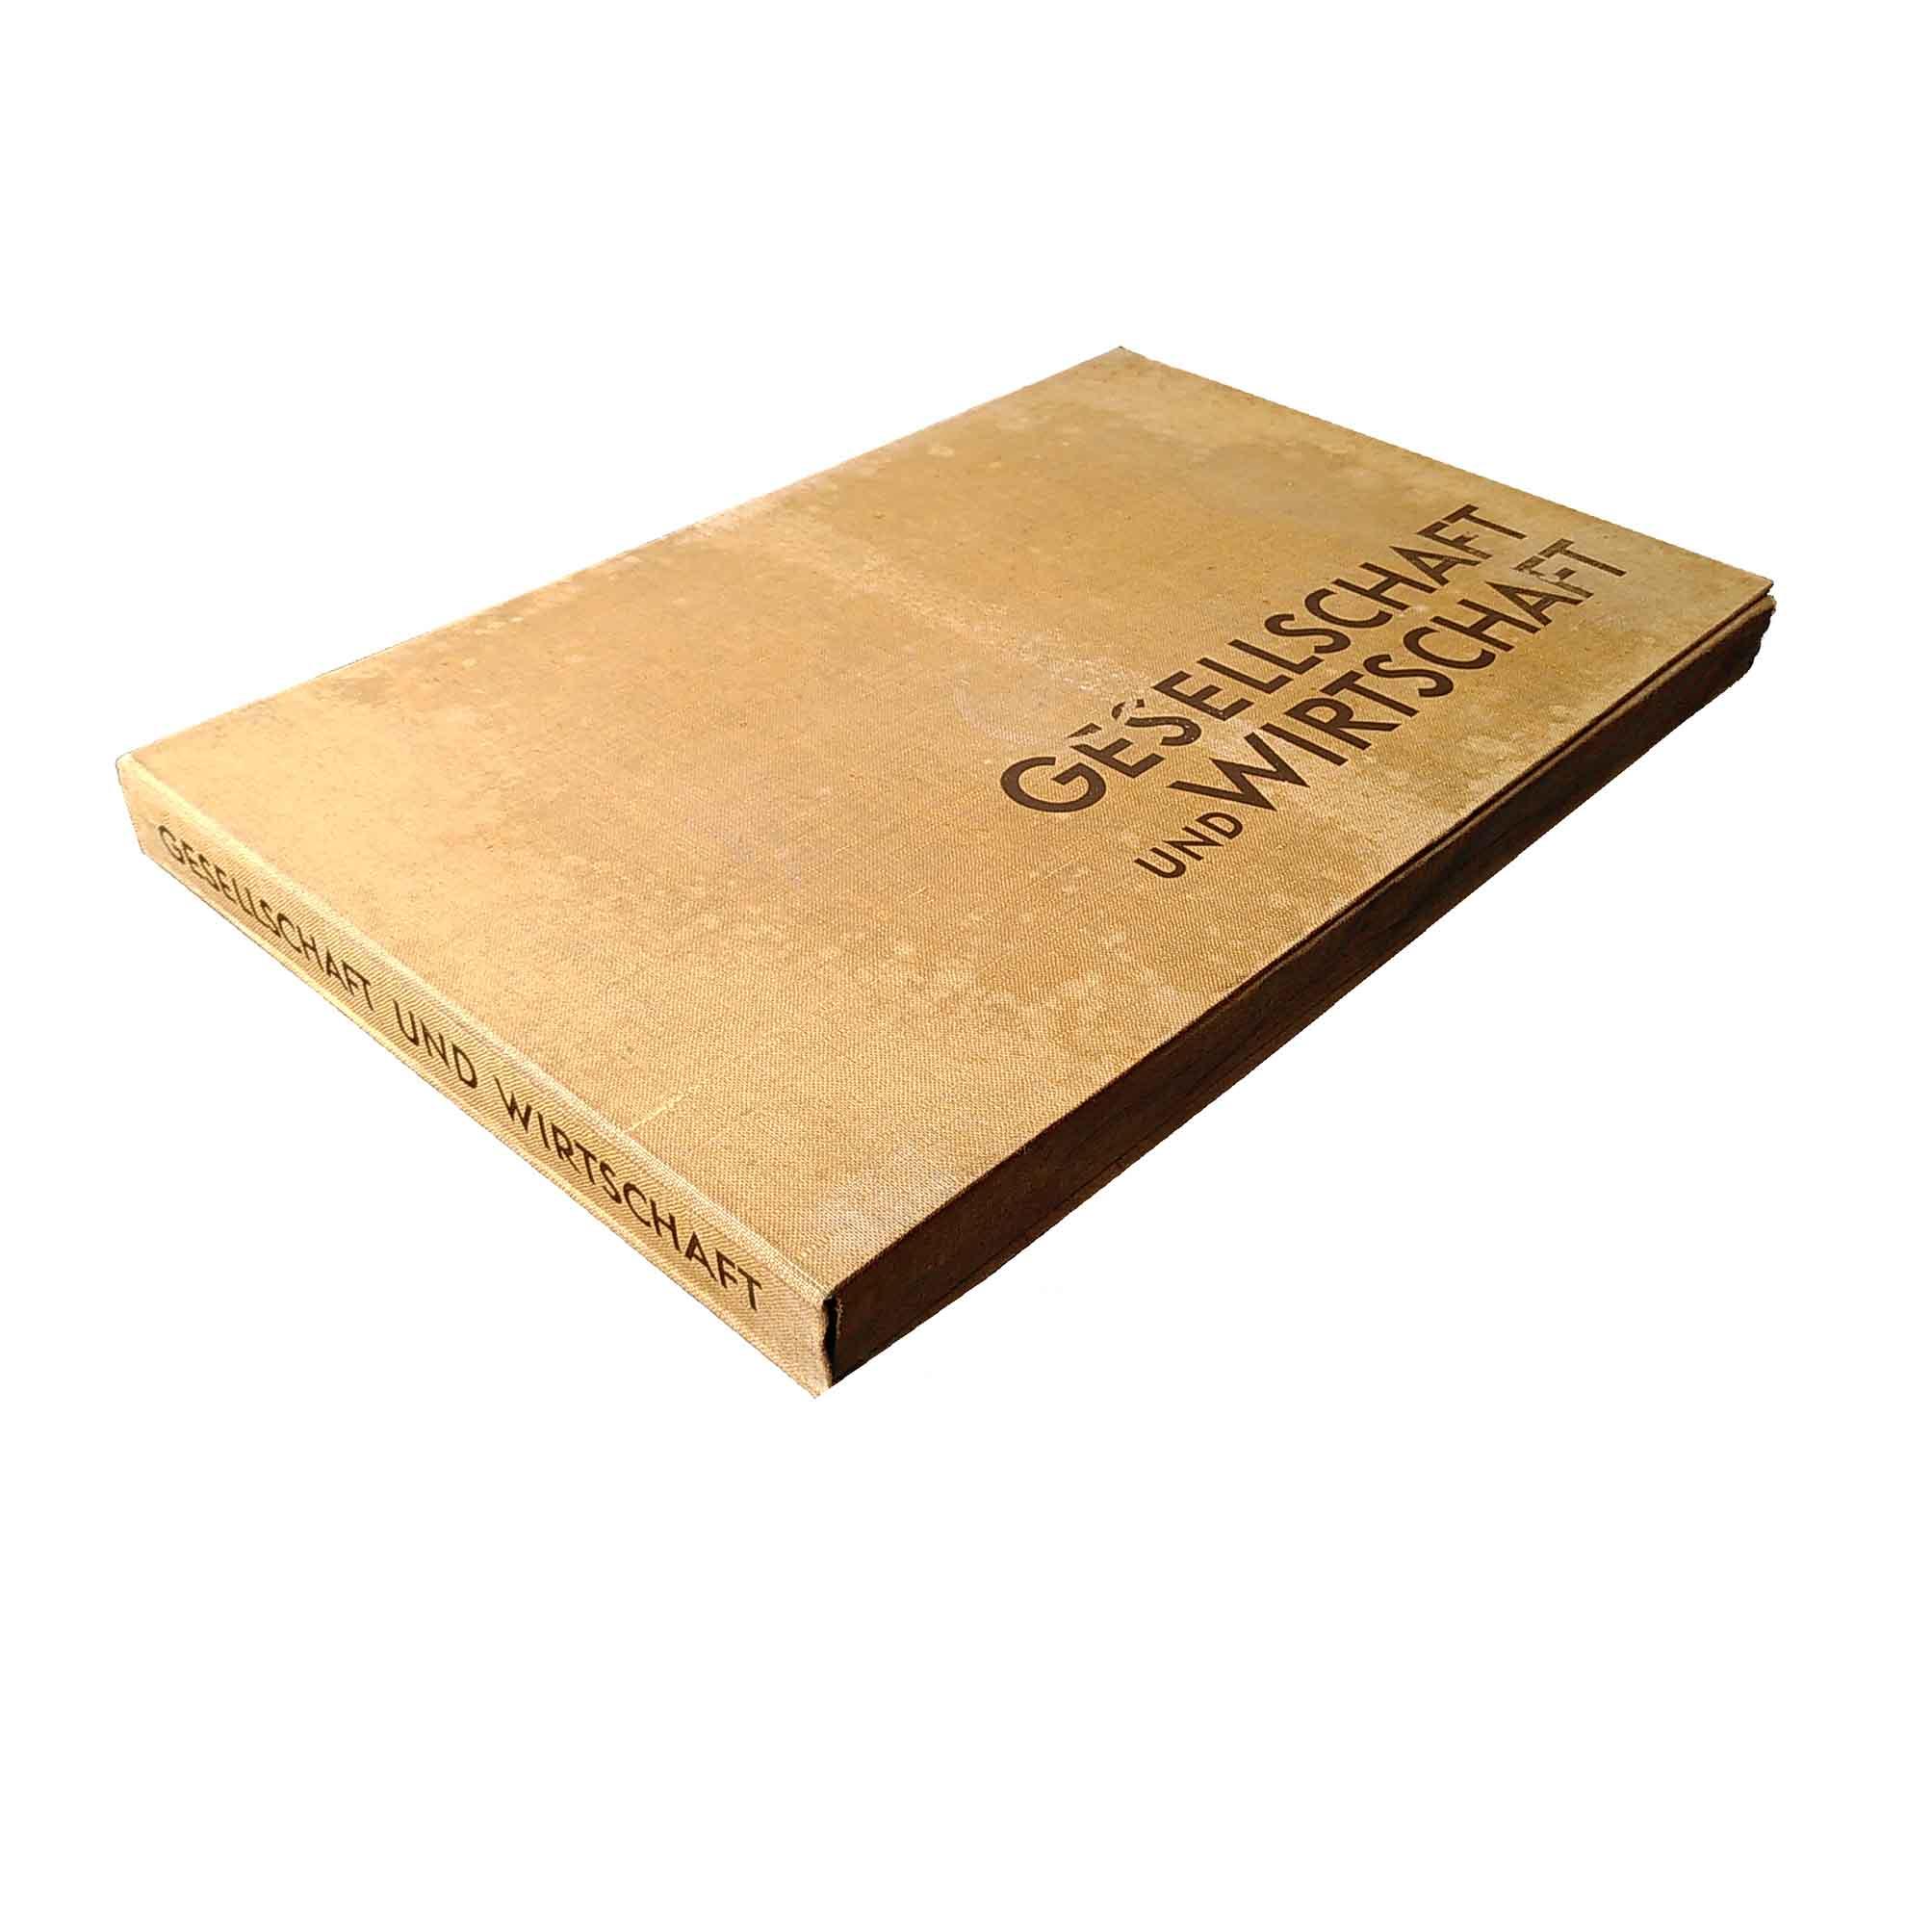 Neurath-Gesellschaft-Wirtschaft-Atlas-1930-Clamshell-Box-Spine-free-N.jpg